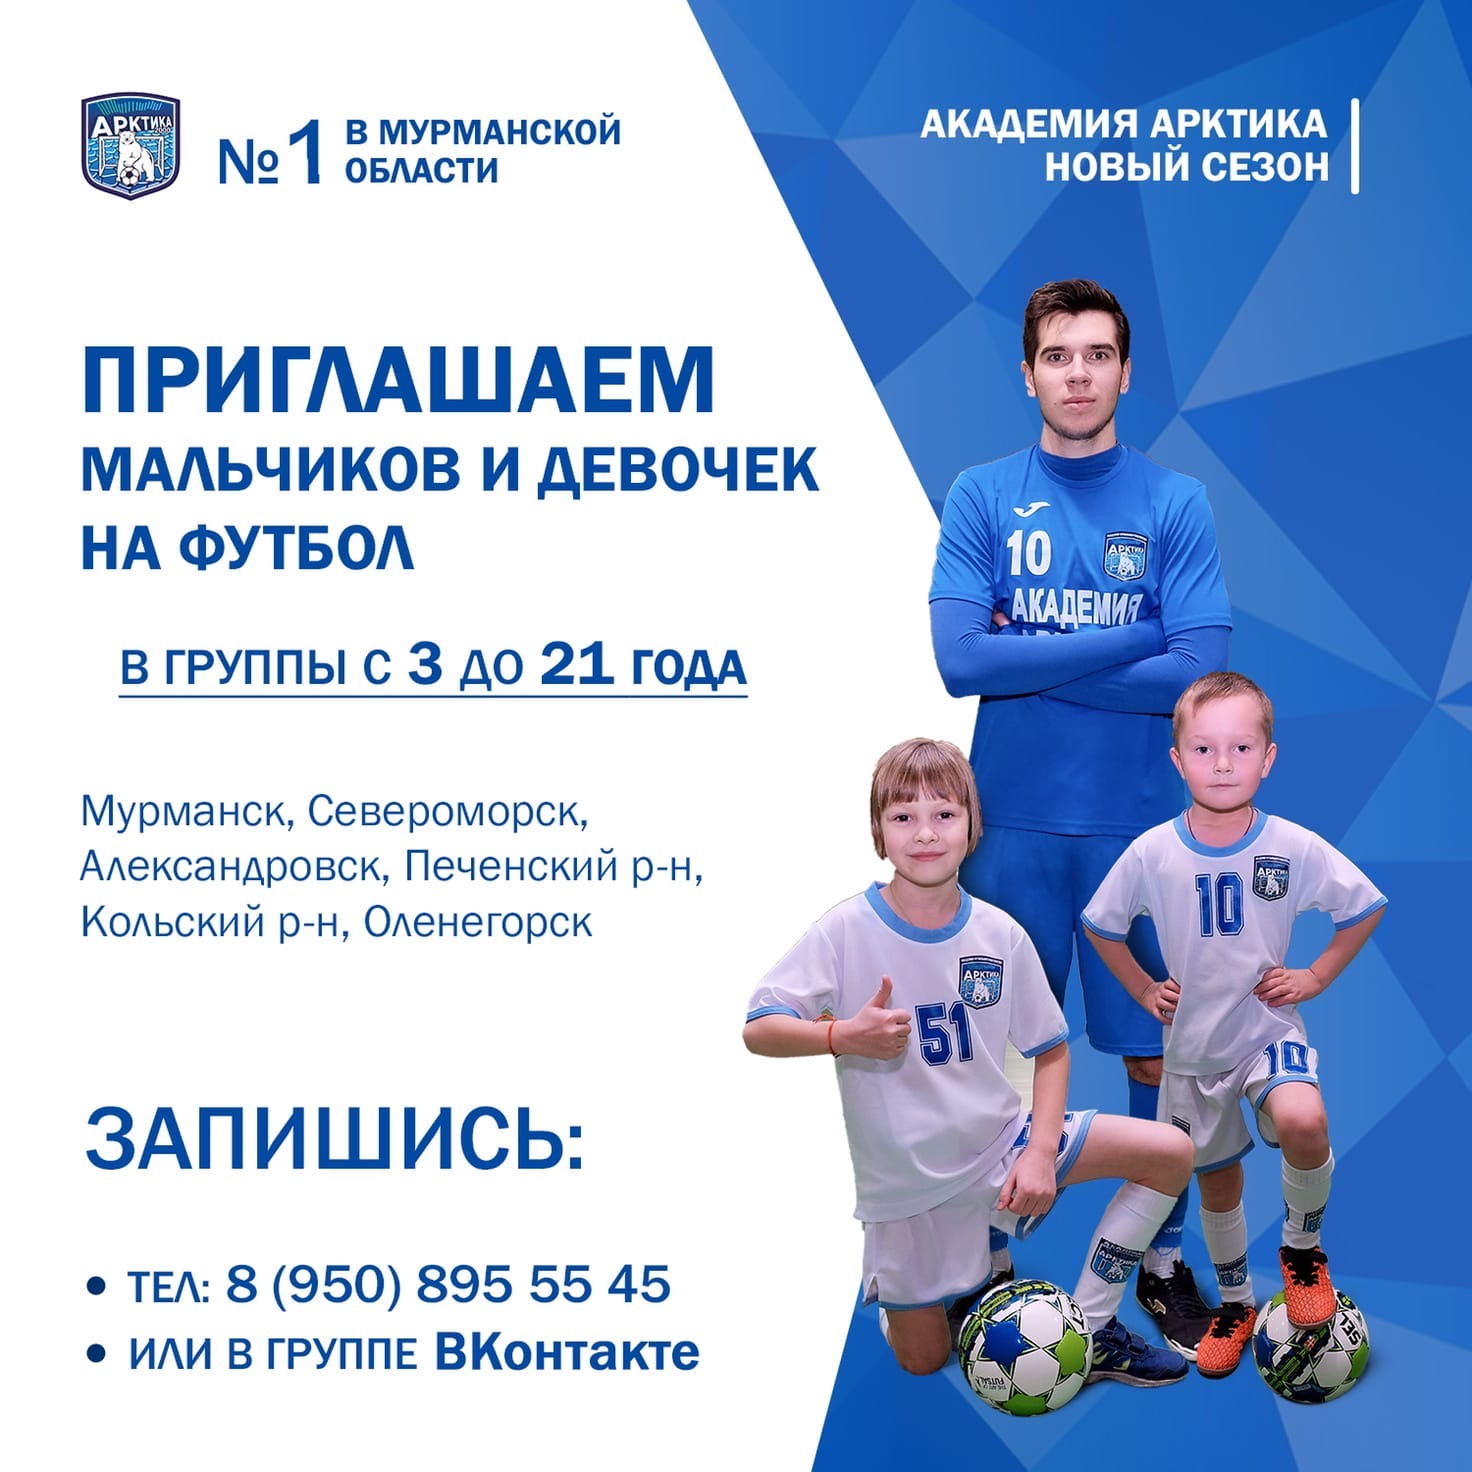 Набор в академию футбола